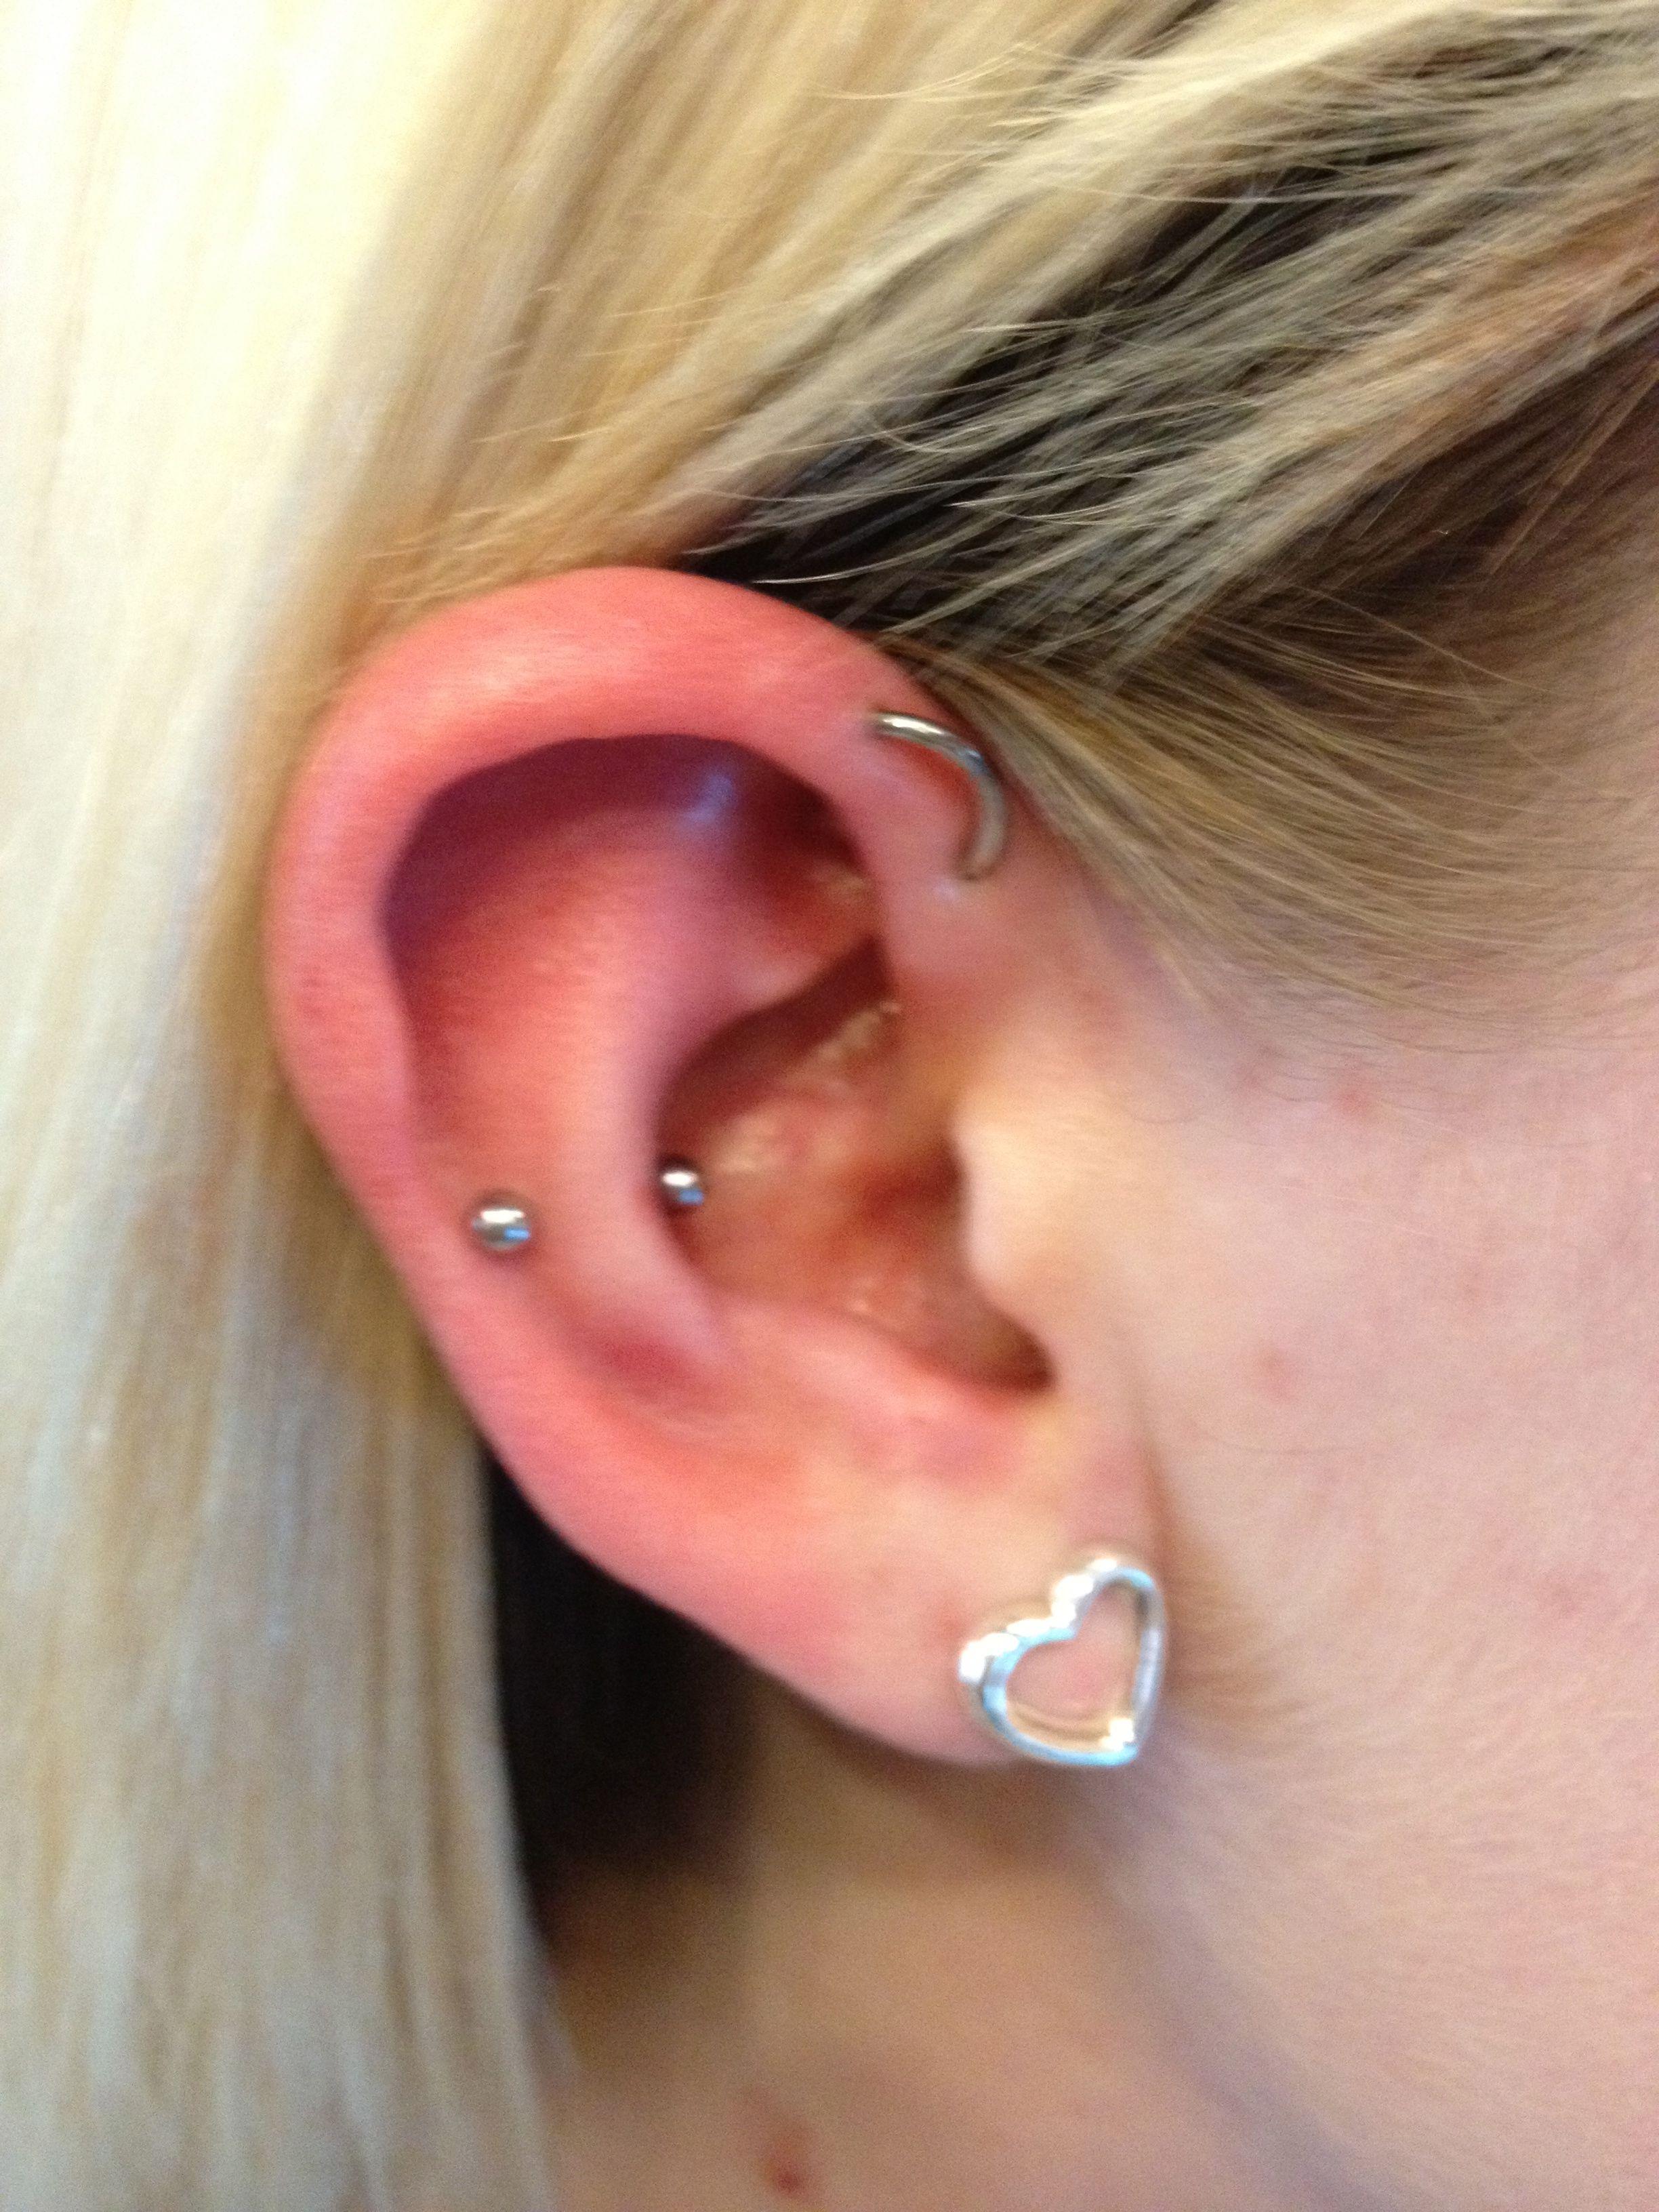 Snug piercing ideas  Forward helix orbital and a snug piercing  piercings  Pinterest